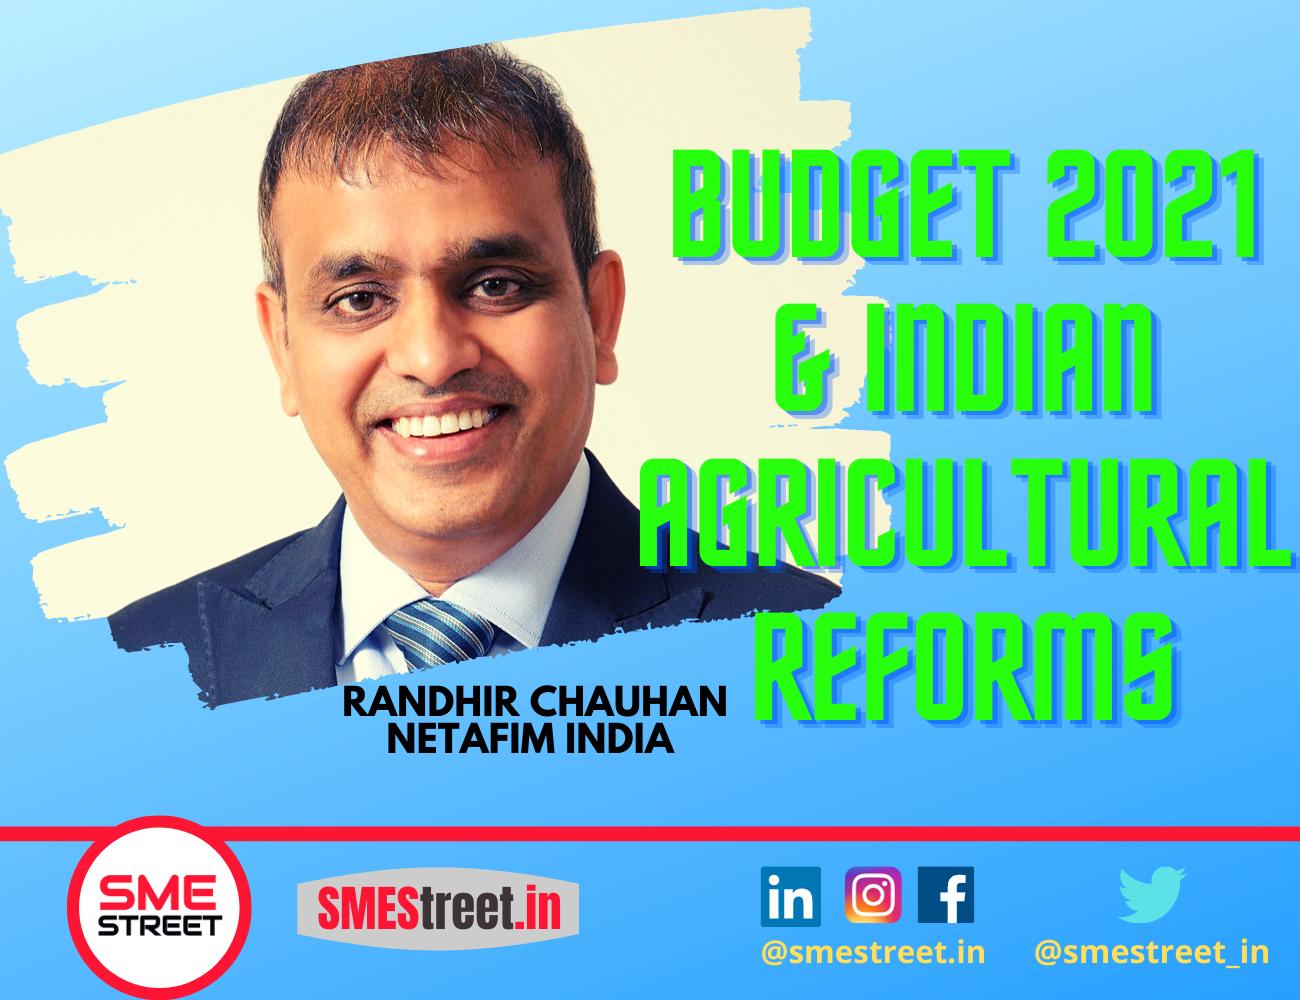 Randhir Chauhan, Netafim India , SMESTreet, Budget 2021 & INdian Agricultural Reforms